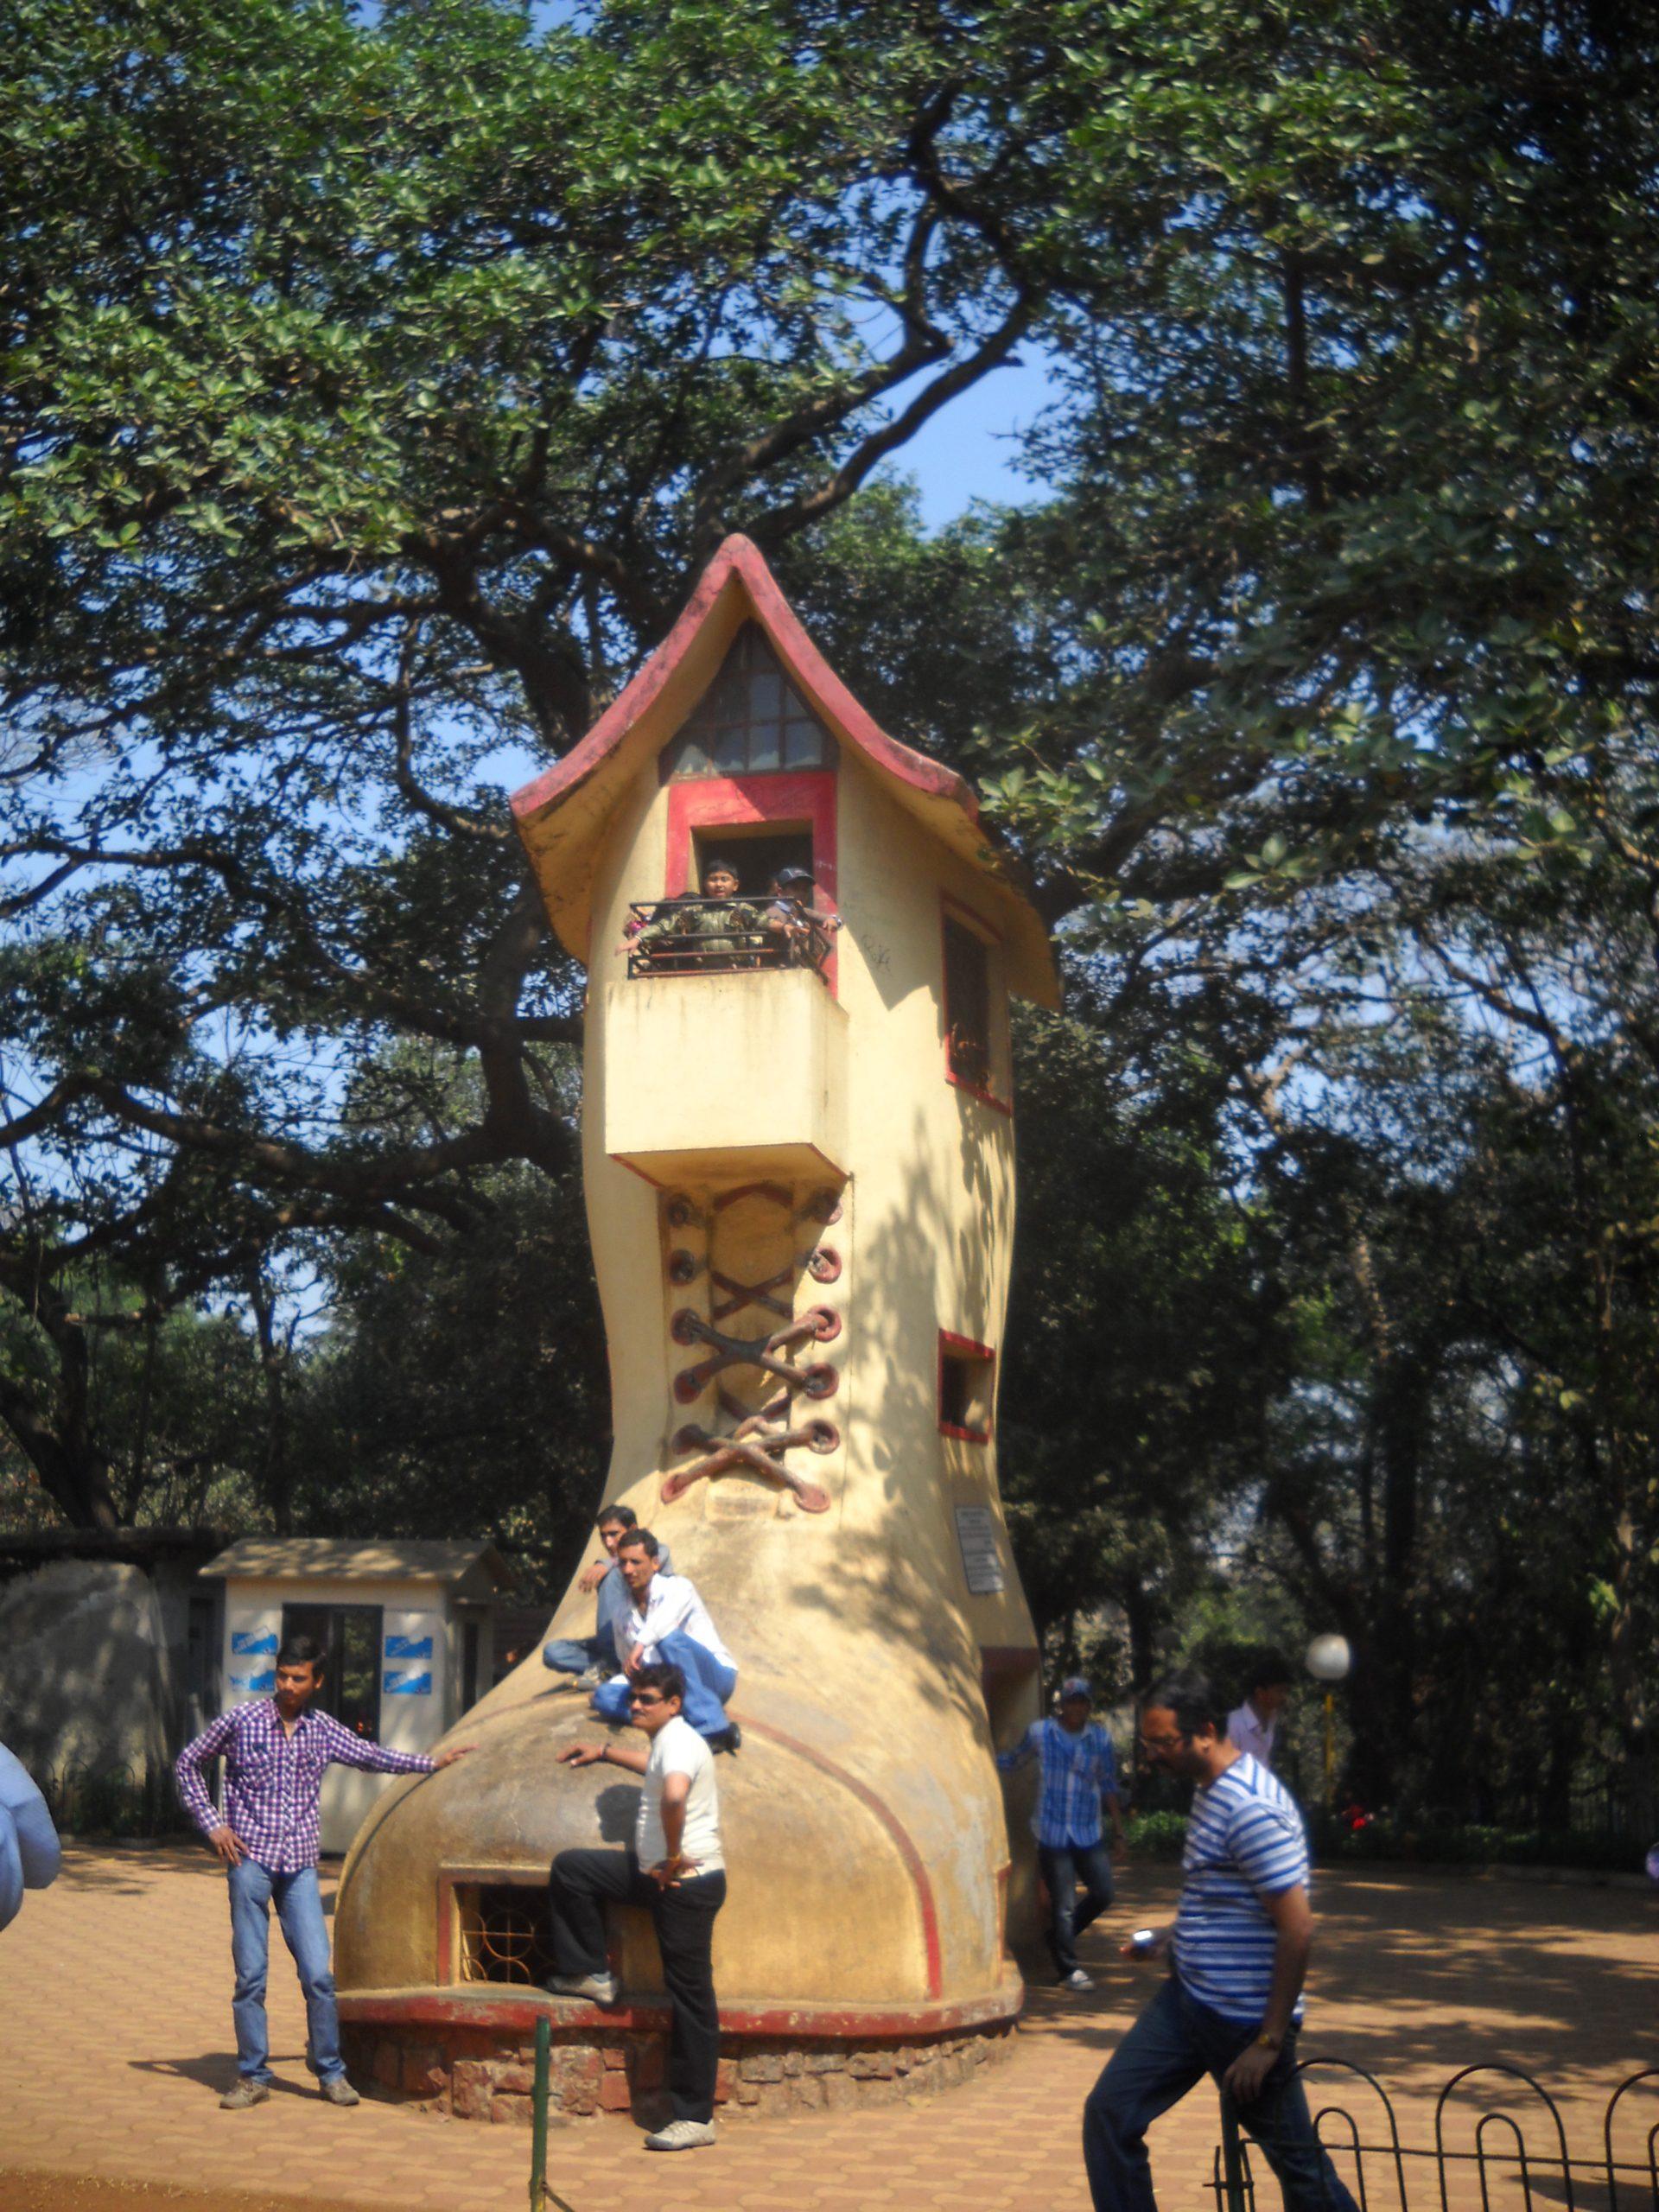 Best Place To Visit Near Bhau Daji Lad Museum in Byculla, Mumbai-Jijamata Udyan